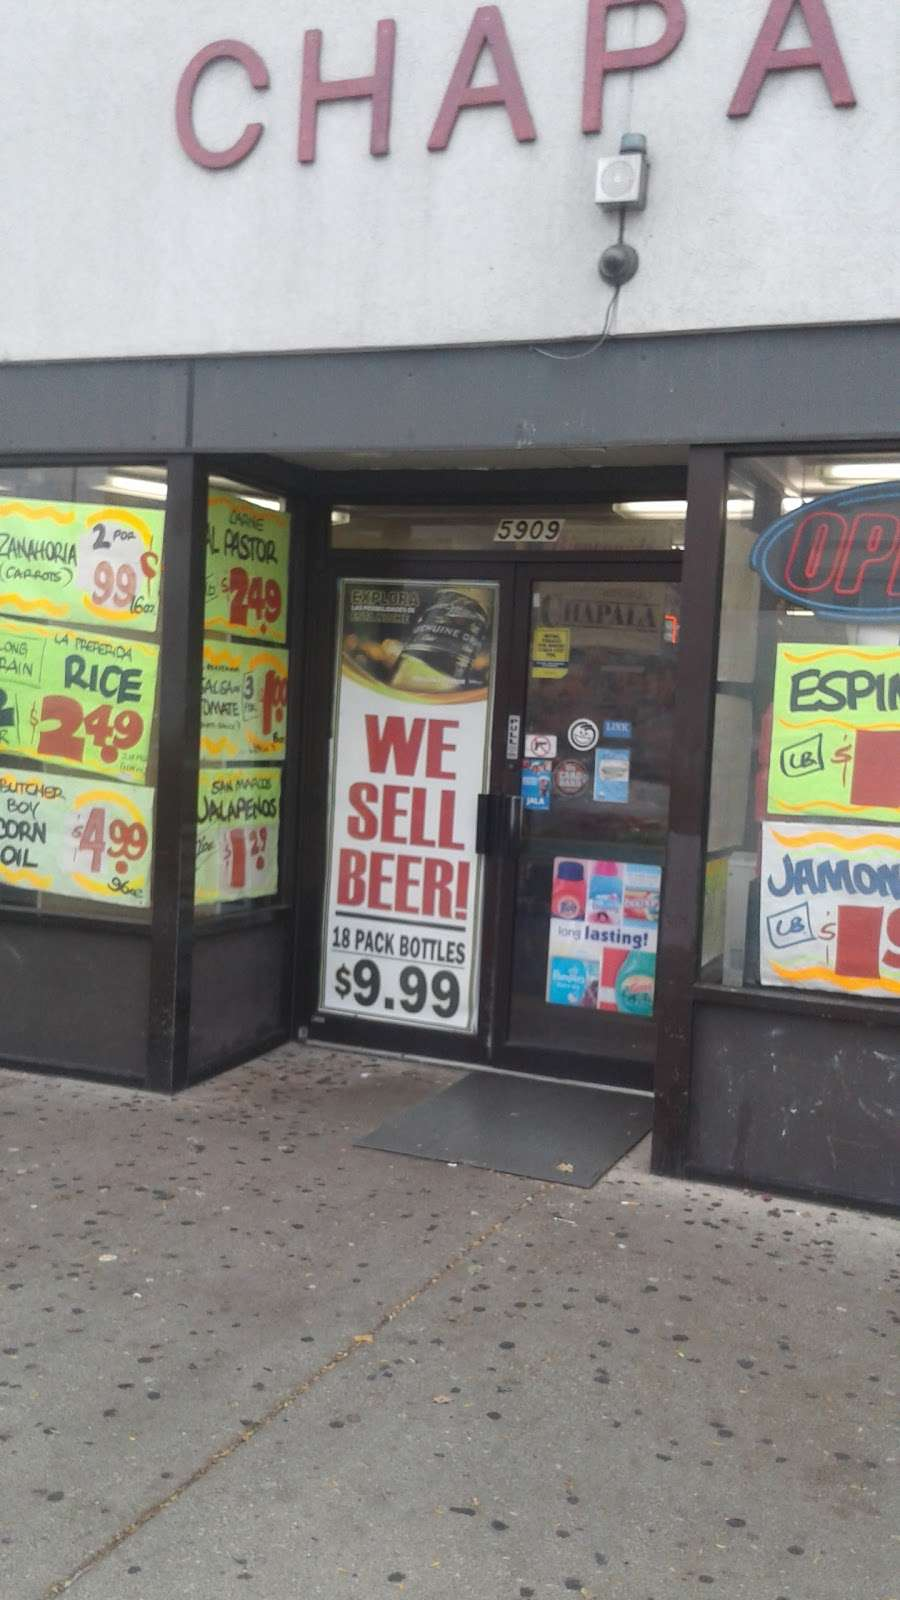 Super Mercado Chapala - supermarket  | Photo 4 of 4 | Address: 5909 W Cermak Rd, Cicero, IL 60804, USA | Phone: (708) 863-3757